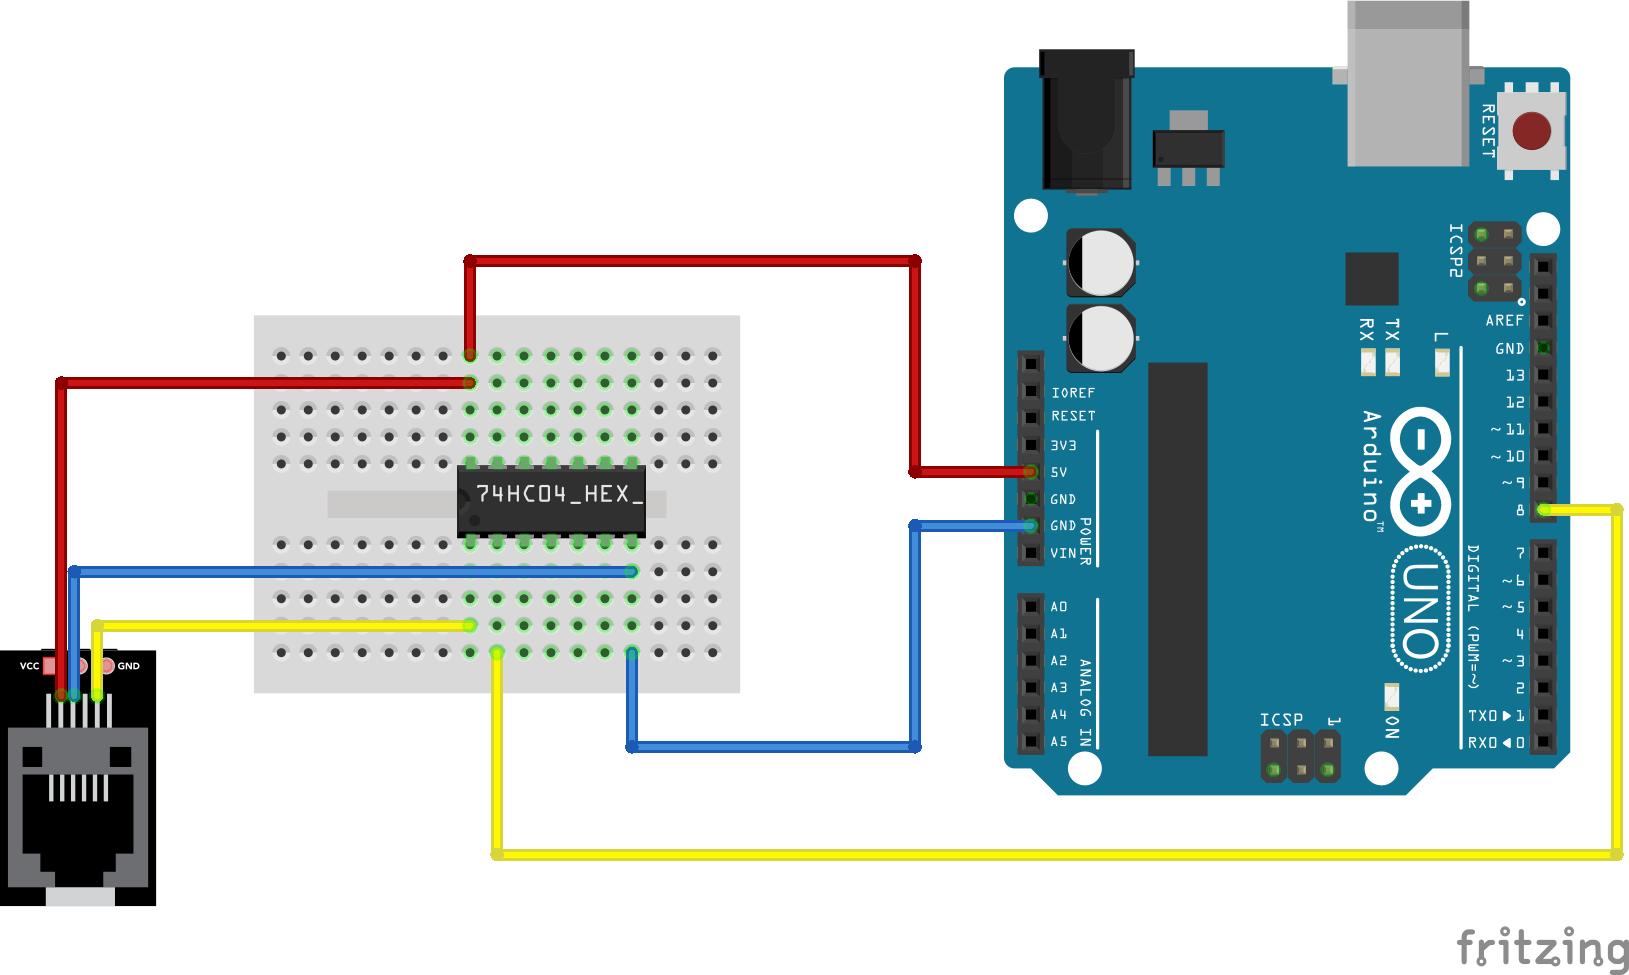 p1 uitlezen arduino inverter gate 7404 IC